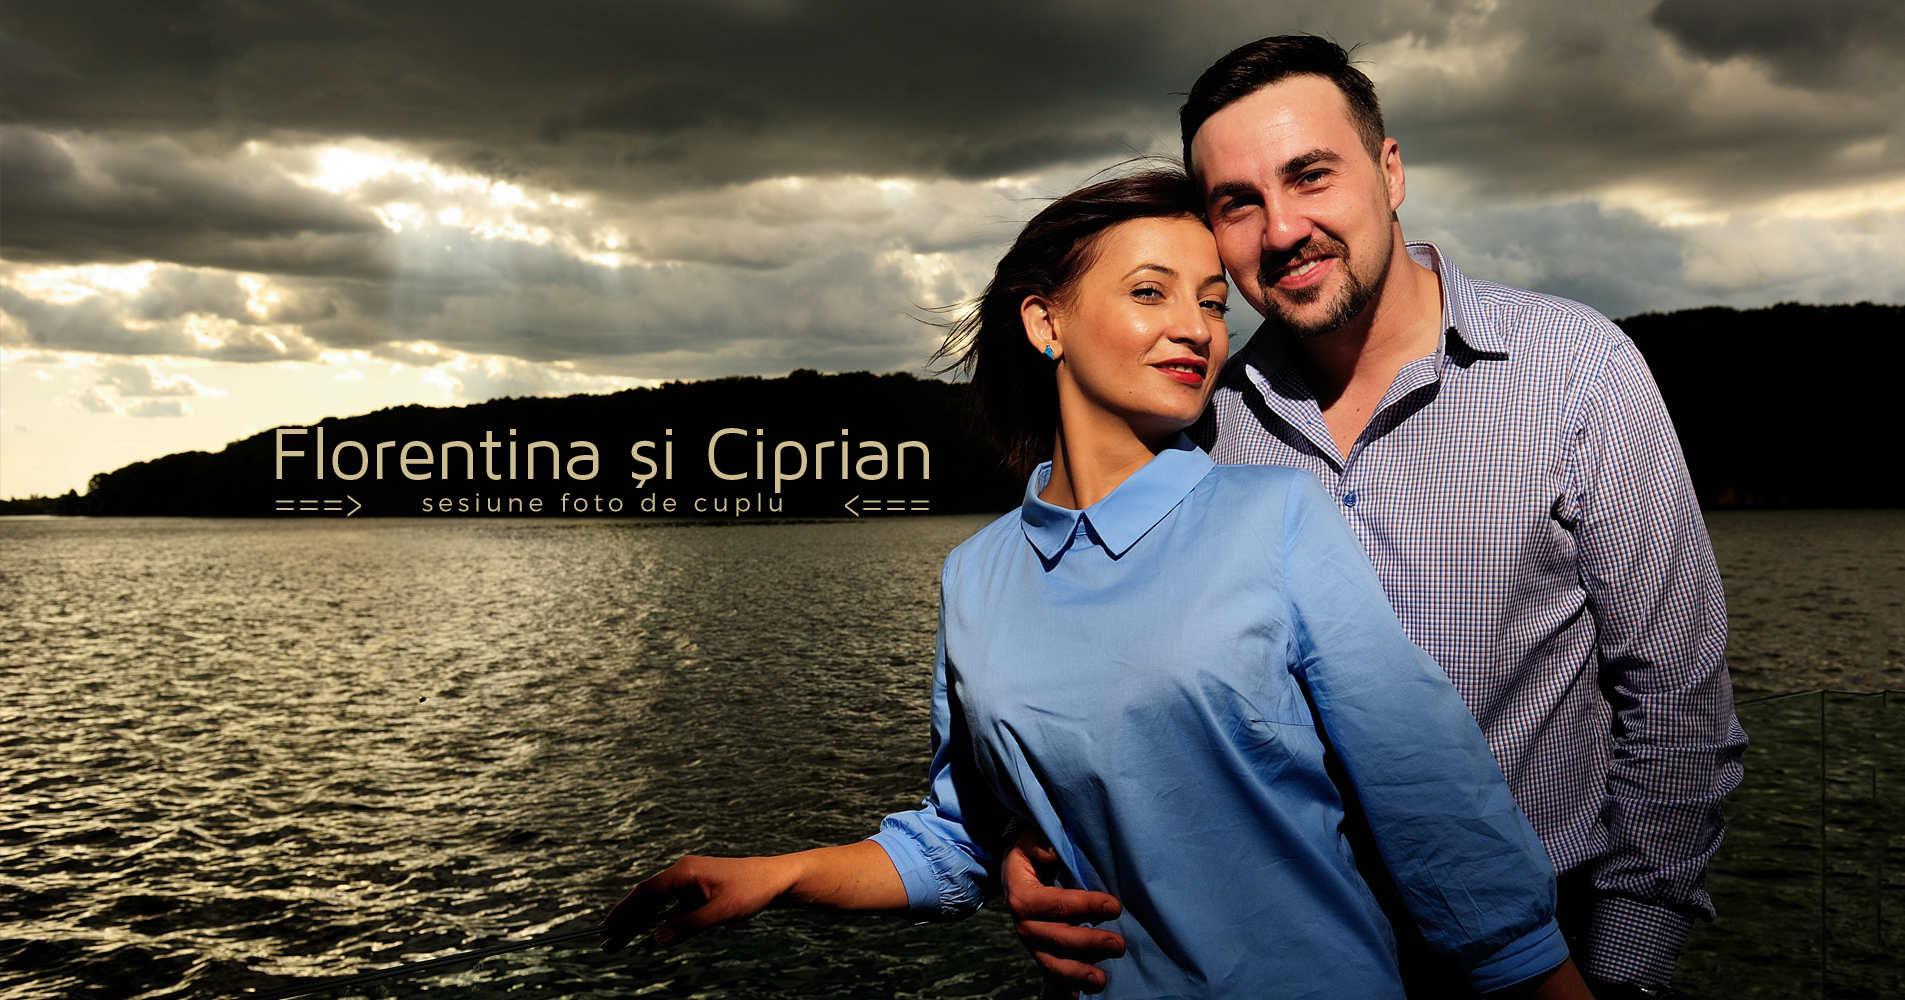 sedinta foto de cuplu la snagov club cu florentina si ciprian